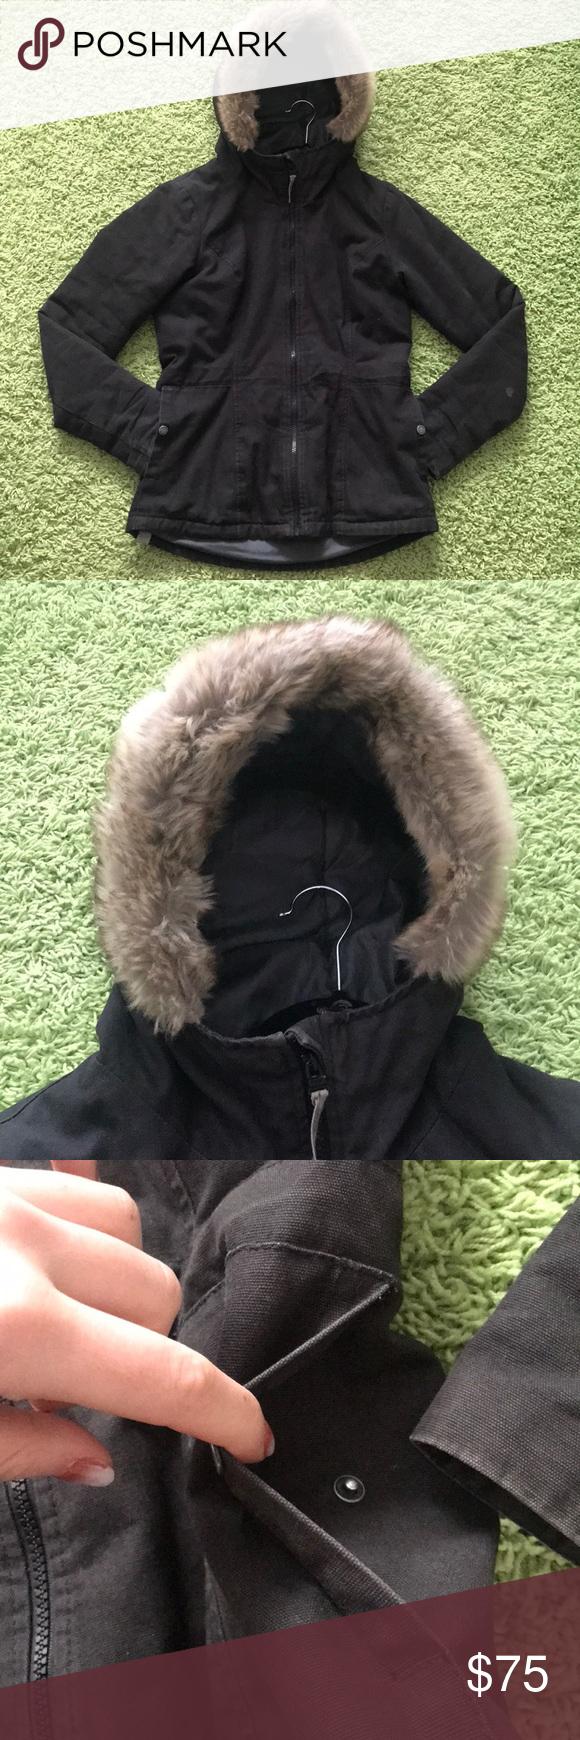 Women S Black Bench Winter Jacket Winter Jackets Jackets Black Bench [ 1740 x 580 Pixel ]